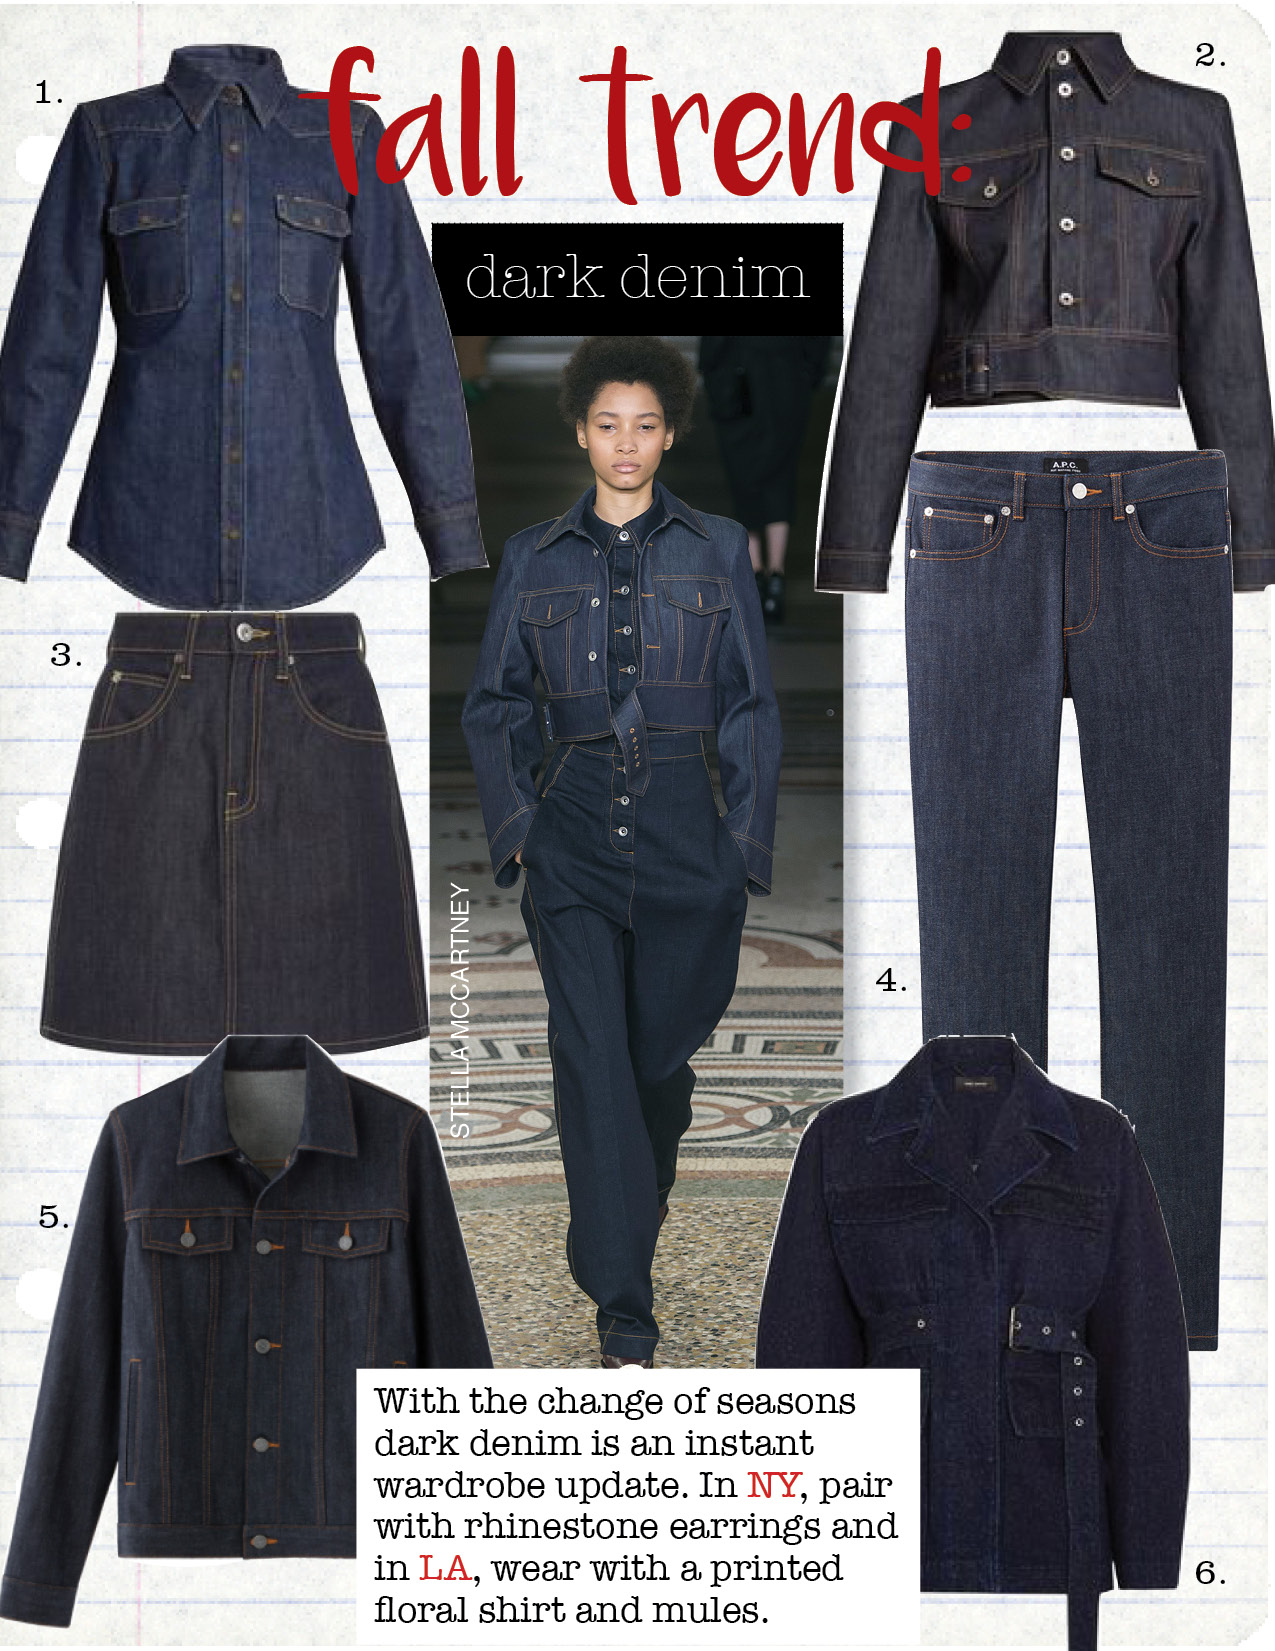 1. calvin klein 205w39nyc western-yoke denim shirt, $422,  matchesfashion.com  2. stella maccartney angelica point-collar cropped denim jacket, $1502,  matchesfashion.com  3. eve denim scout denim mini skirt, $225,  modaoperandi.com  4. a.p.c. denim high standard jeans, $210,  usonline.apc.fr  5. a.p.c. denim brandy jacket, $270,  usonline.apc.fr  6. isabel marant pleyel belted denim jacket, $755,  net-a-porter.com